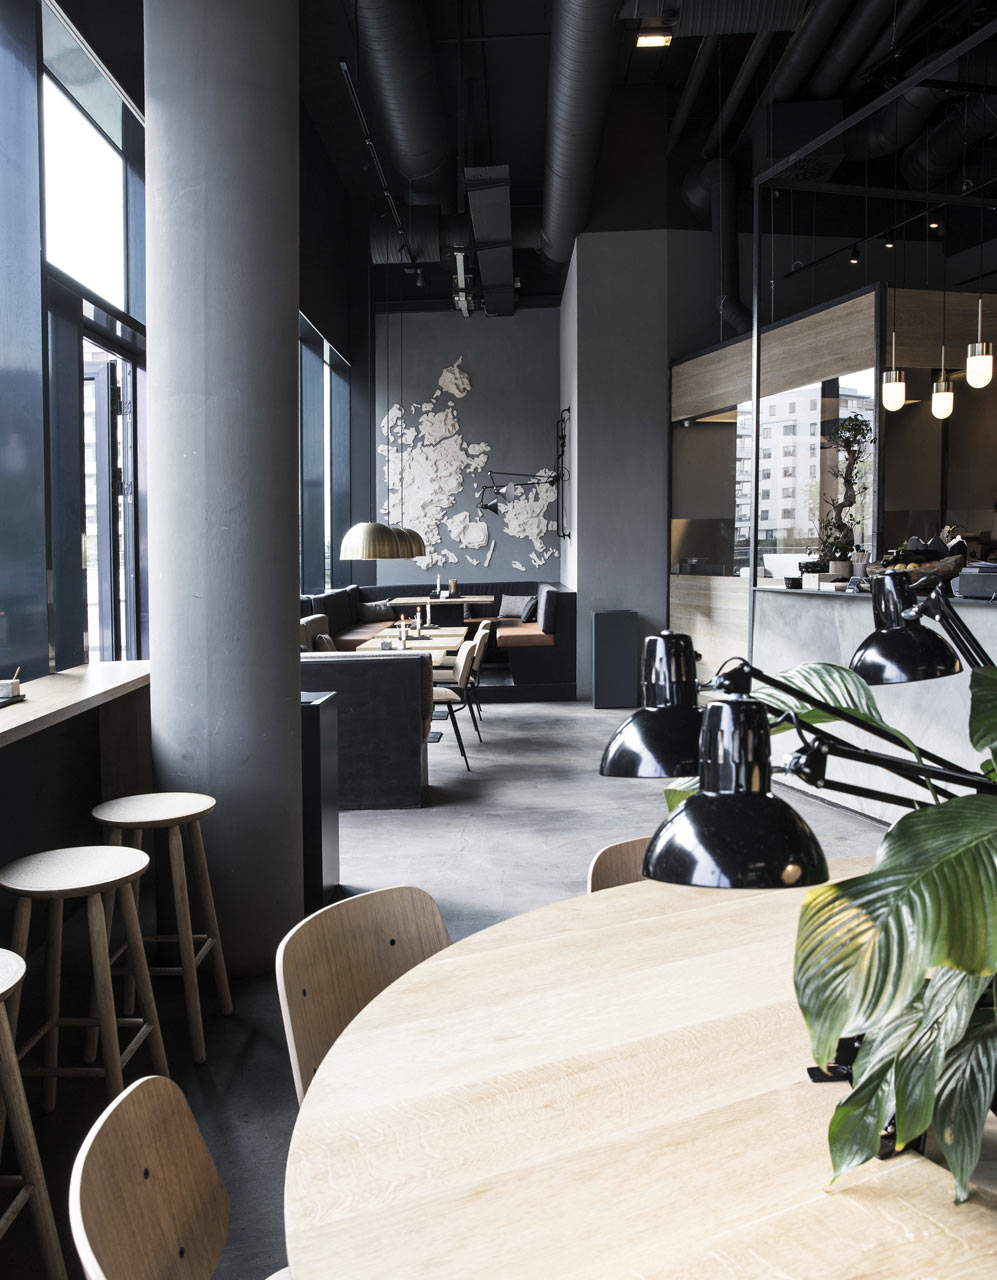 johannes torpe studios designs a healthy fast food restaurant 6 Johannes Torpe Studios Designs a Healthy Fast Food Restaurant